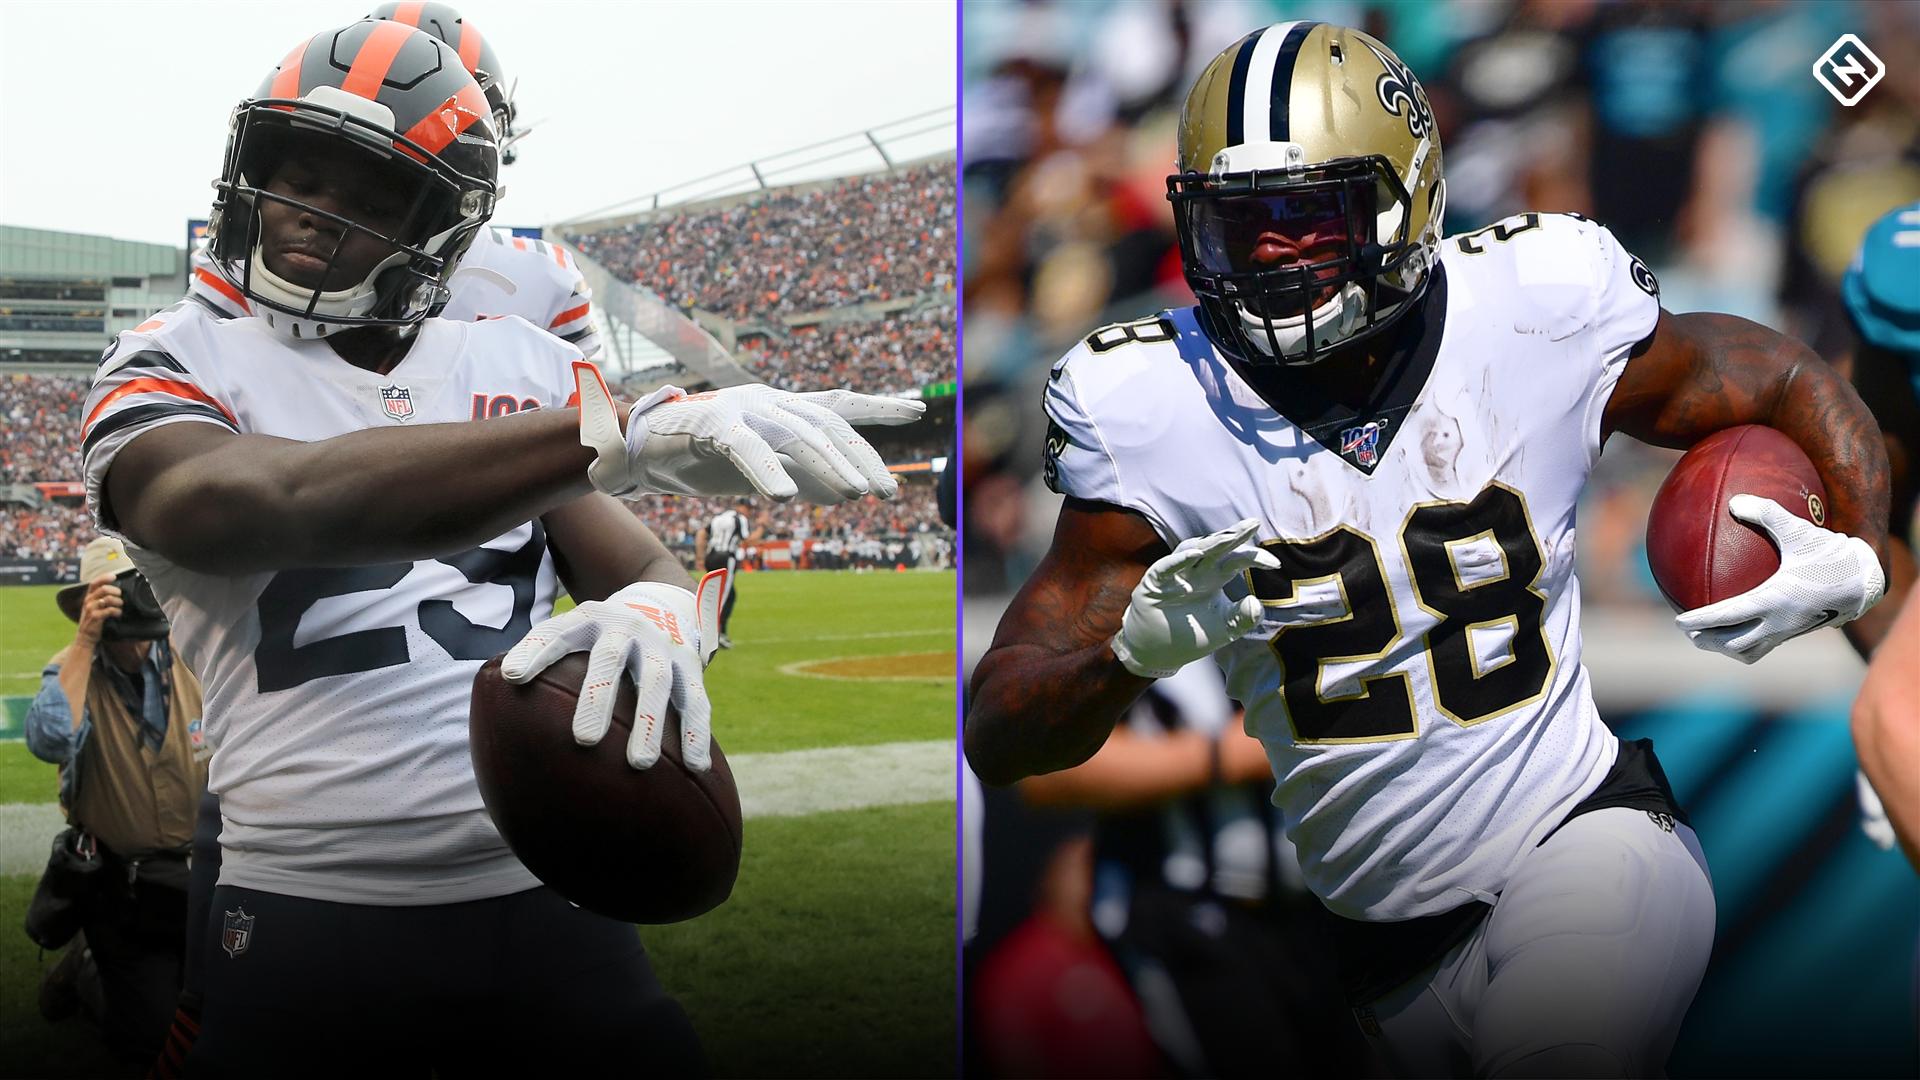 DraftKings Week 7 Sunday NFL Showdown: Picks, advice for Saints vs. Bears DFS